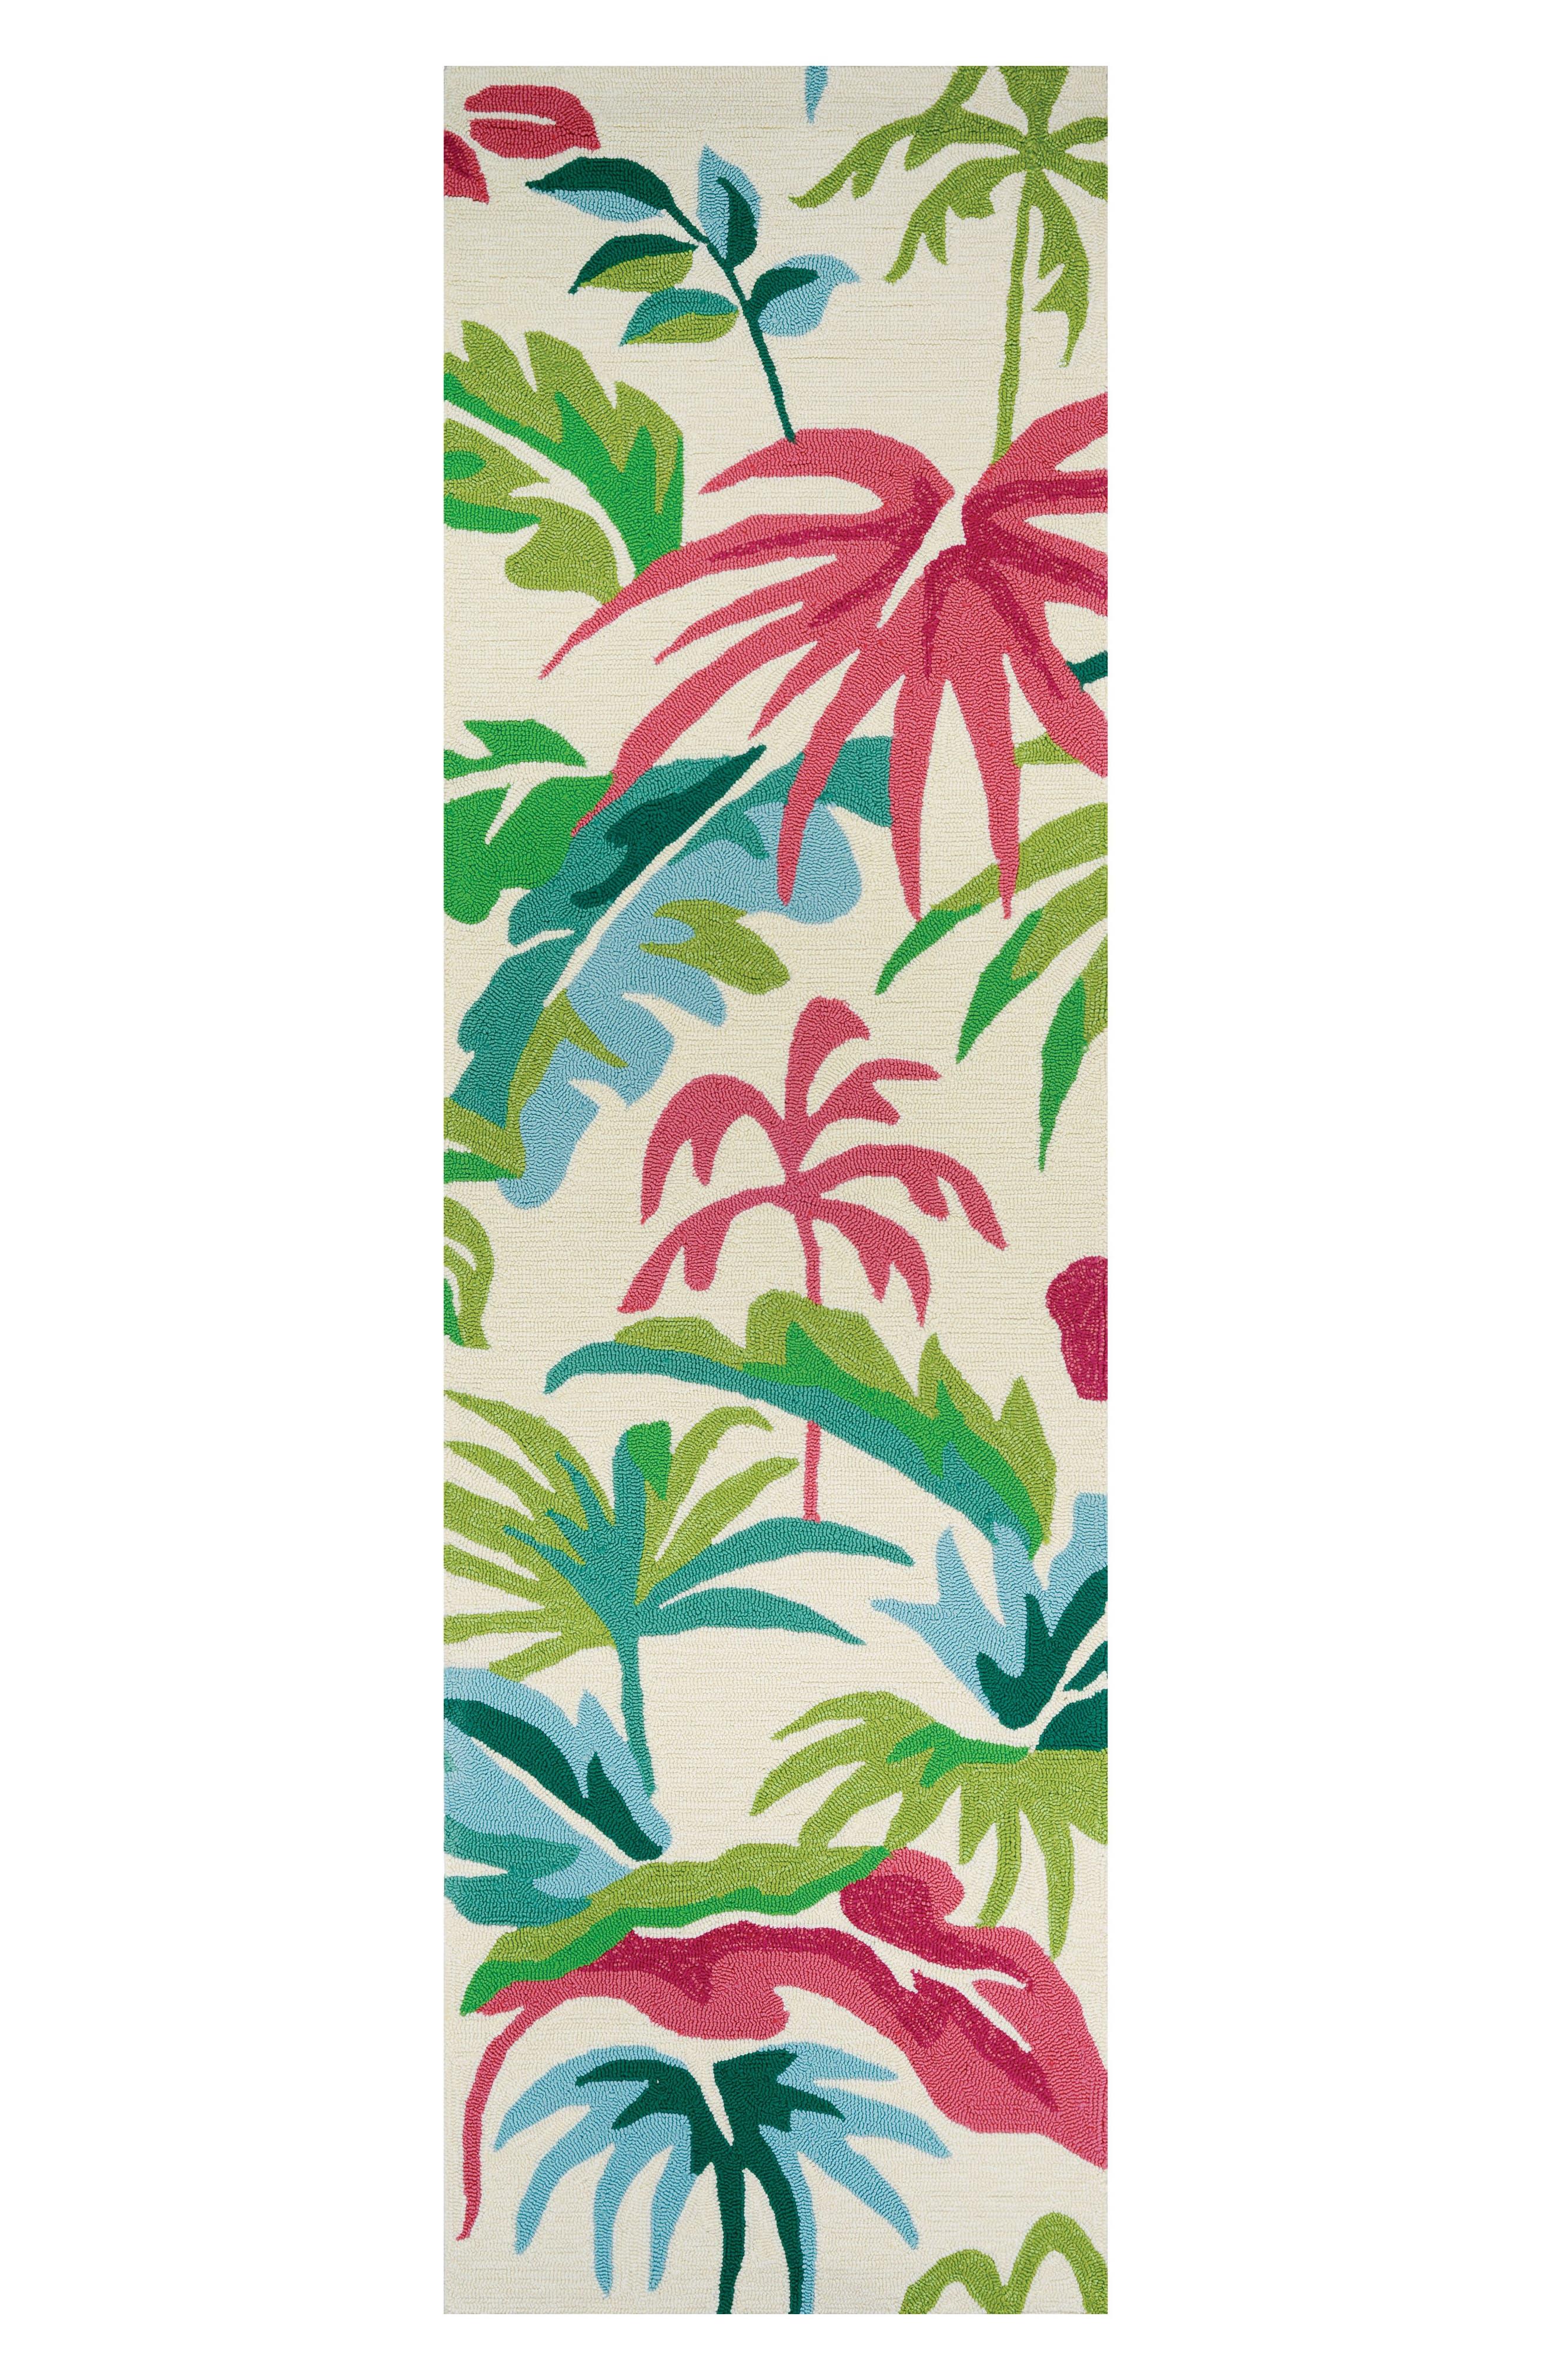 Fiji Indoor/Outdoor Rug,                             Alternate thumbnail 2, color,                             Pink/ Green/ Multi